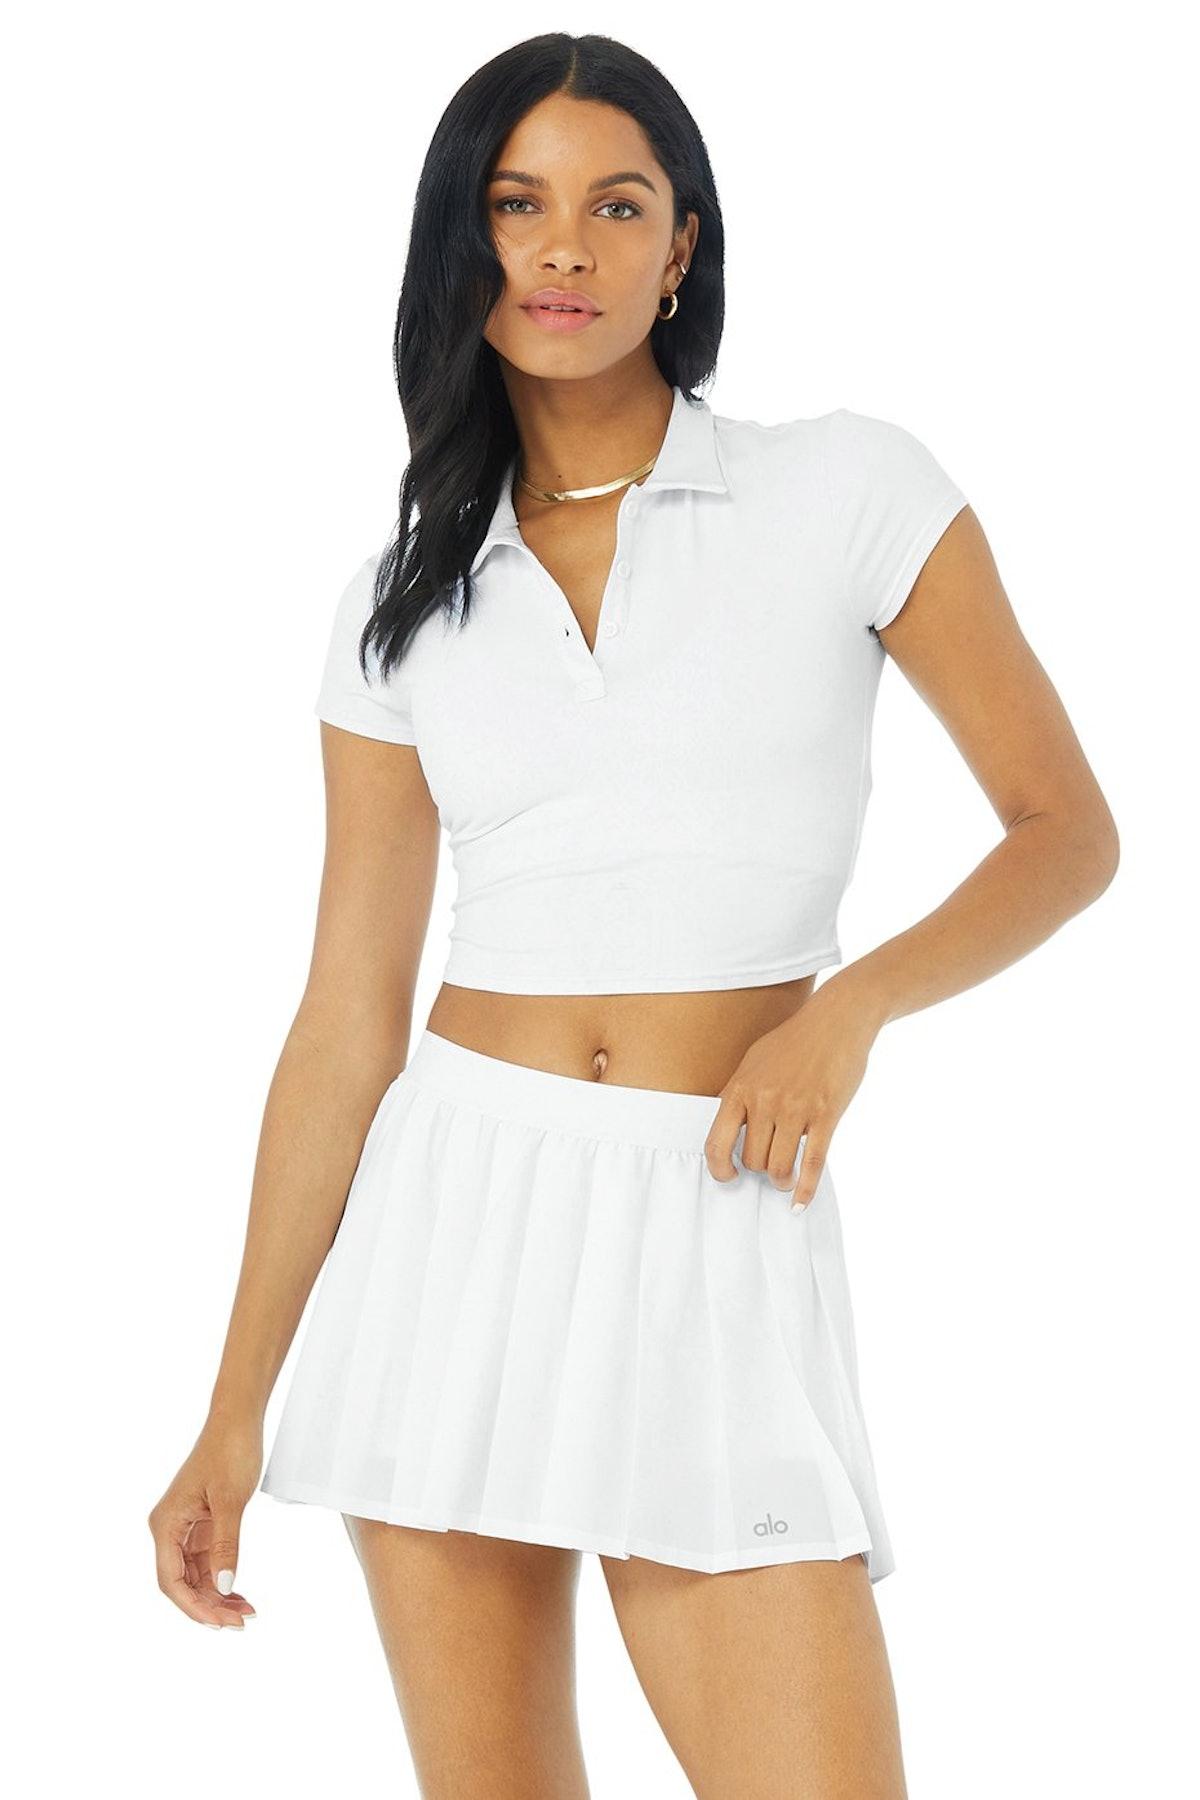 Alo Yoga white polo shirt